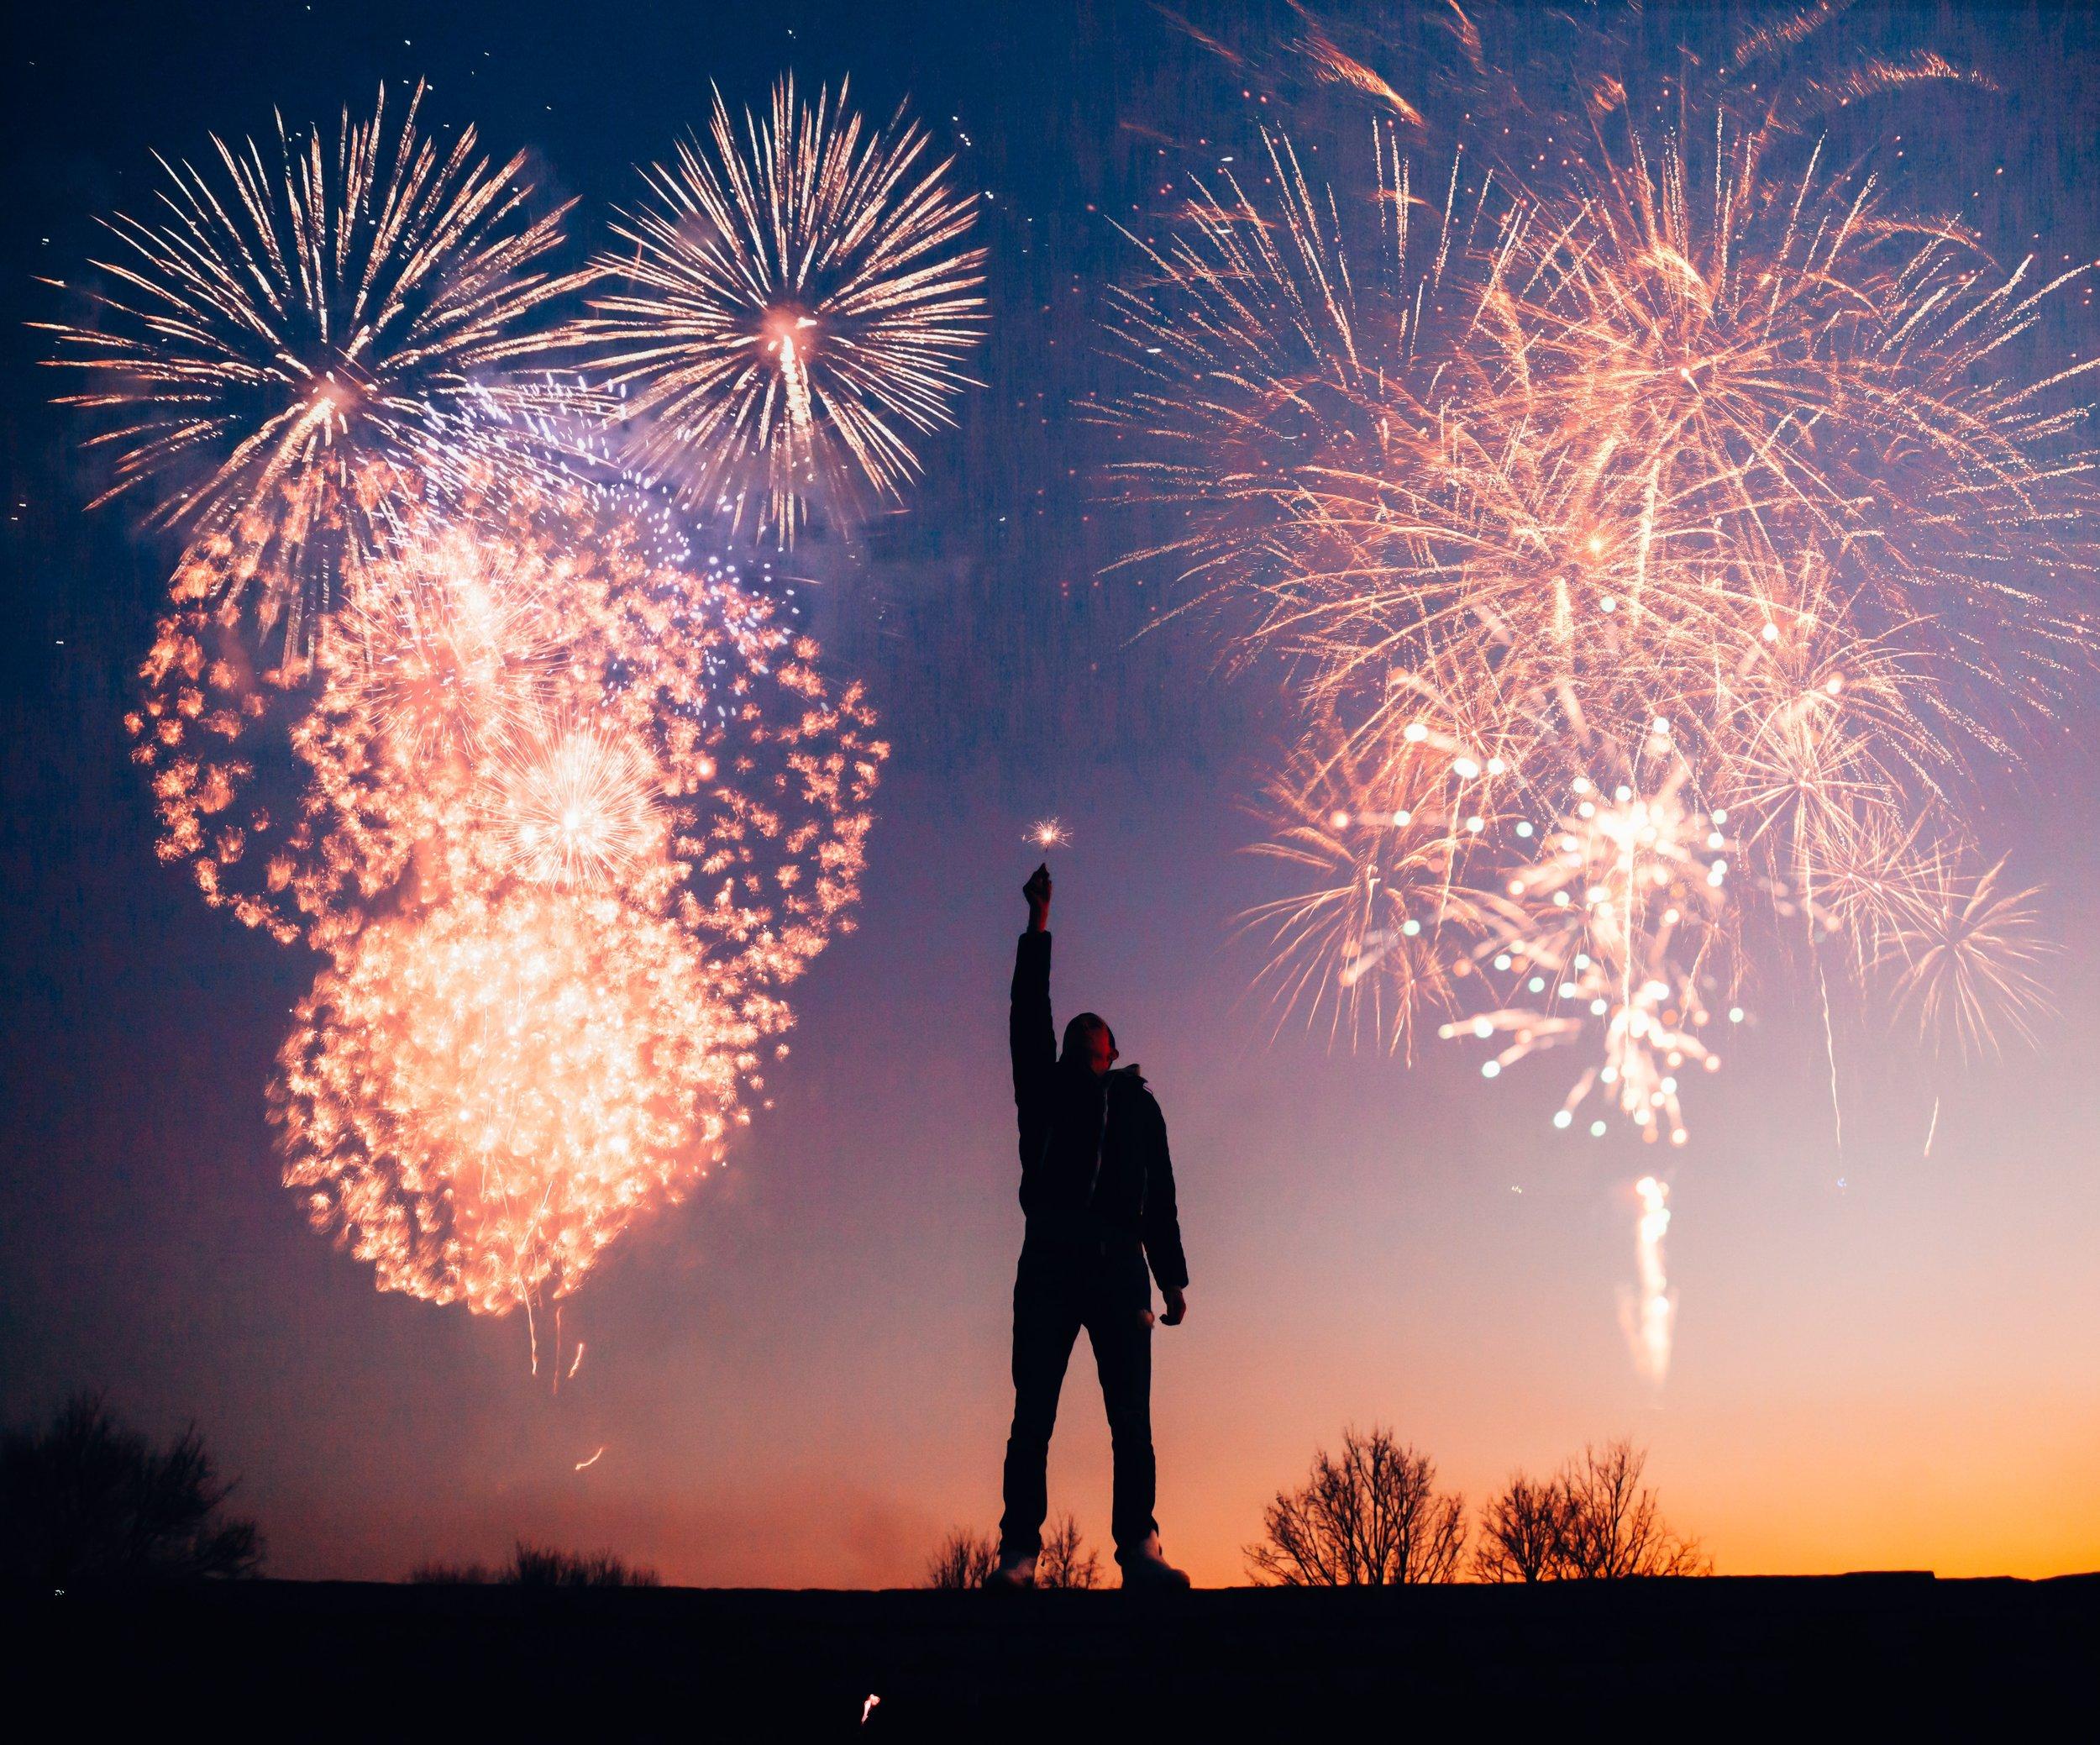 bright-celebrate-celebration-769525.jpg